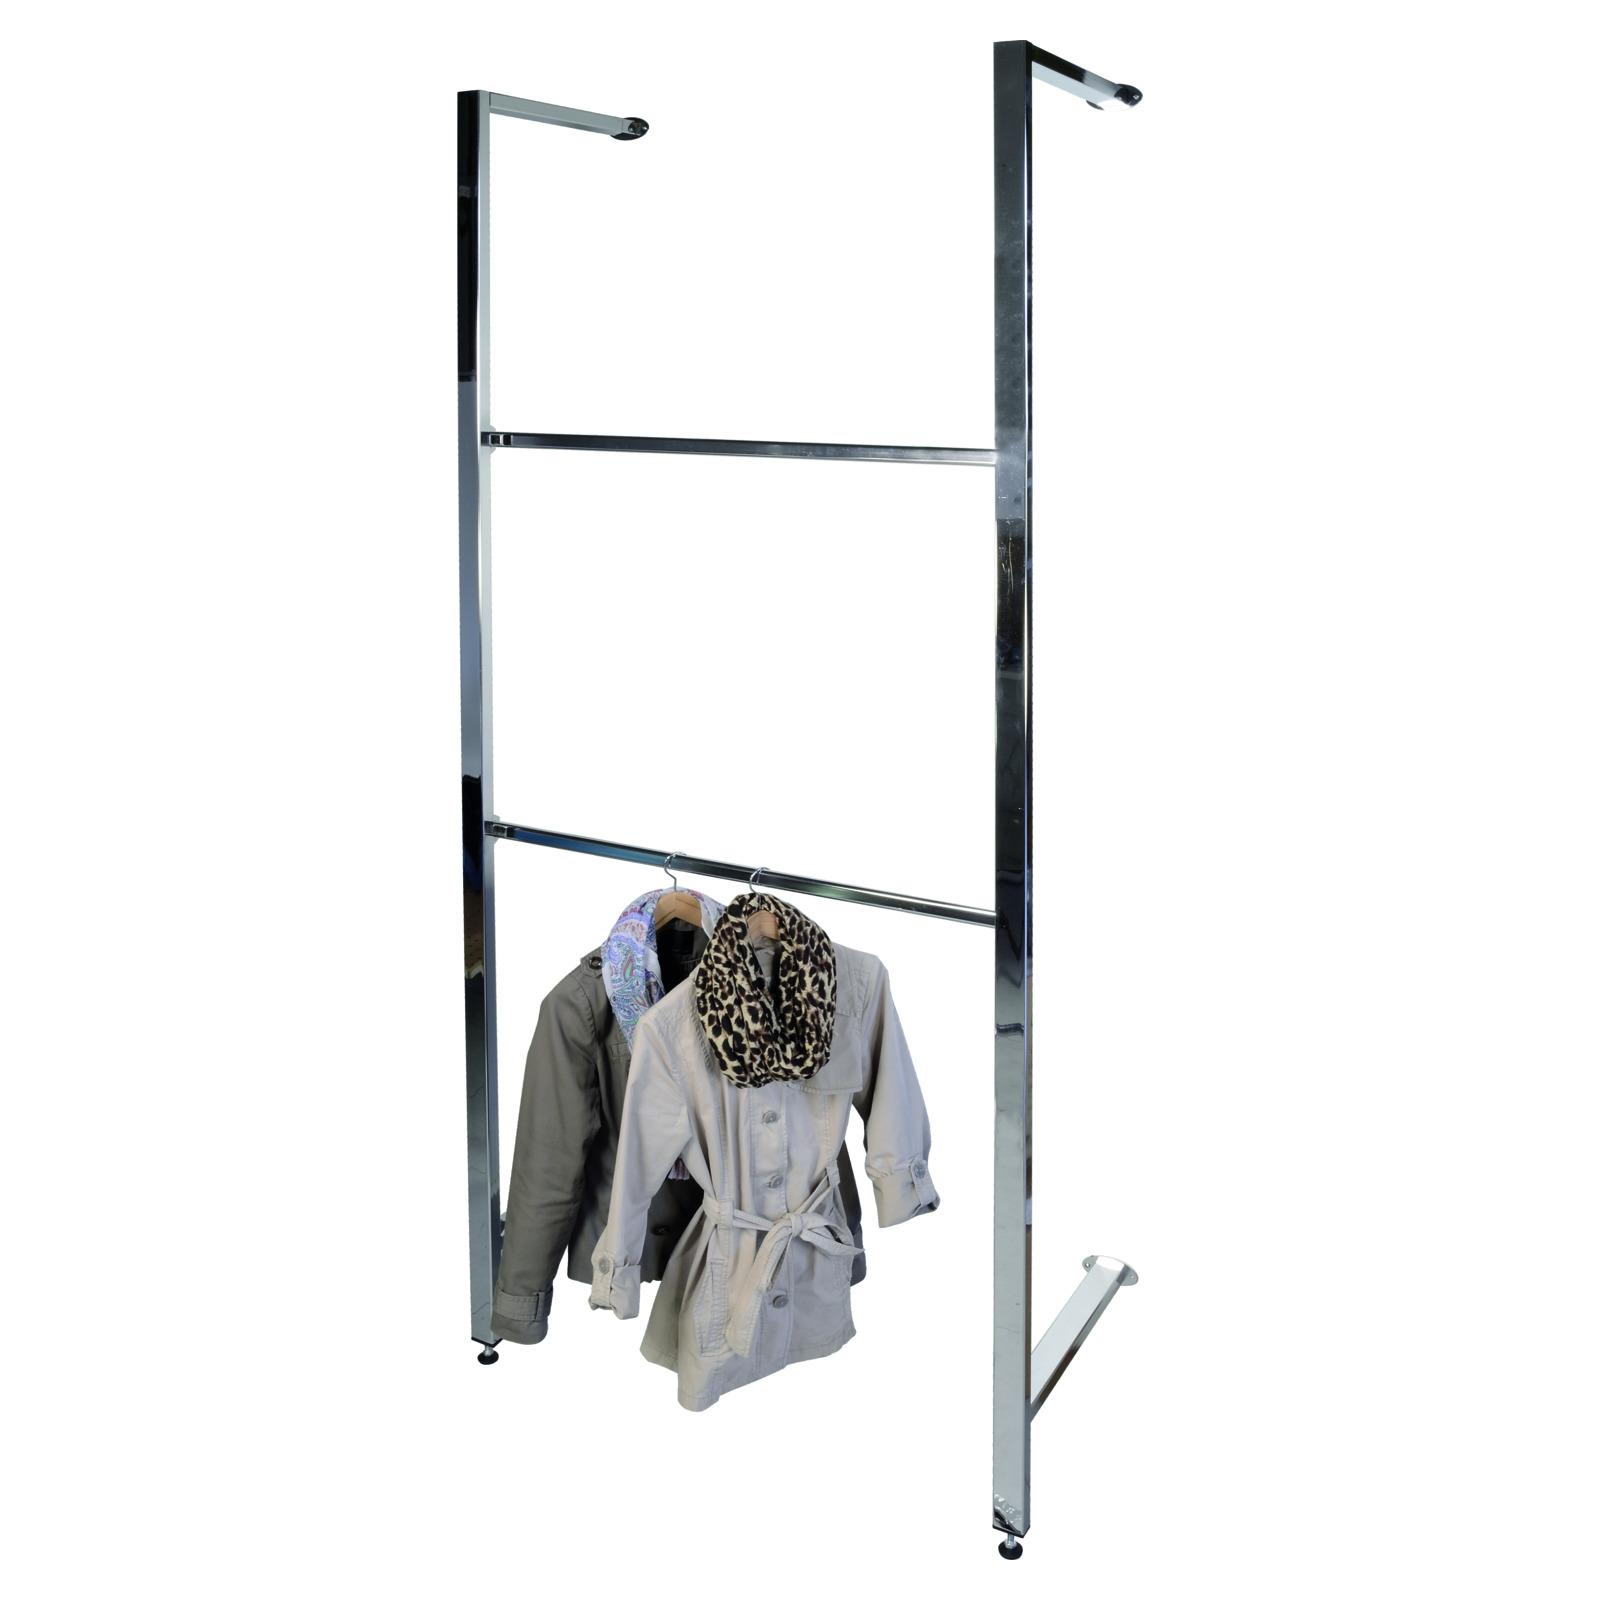 ladeneinrichtung easy back 100 cm breit mit zwei tragestang wandregal easy back. Black Bedroom Furniture Sets. Home Design Ideas